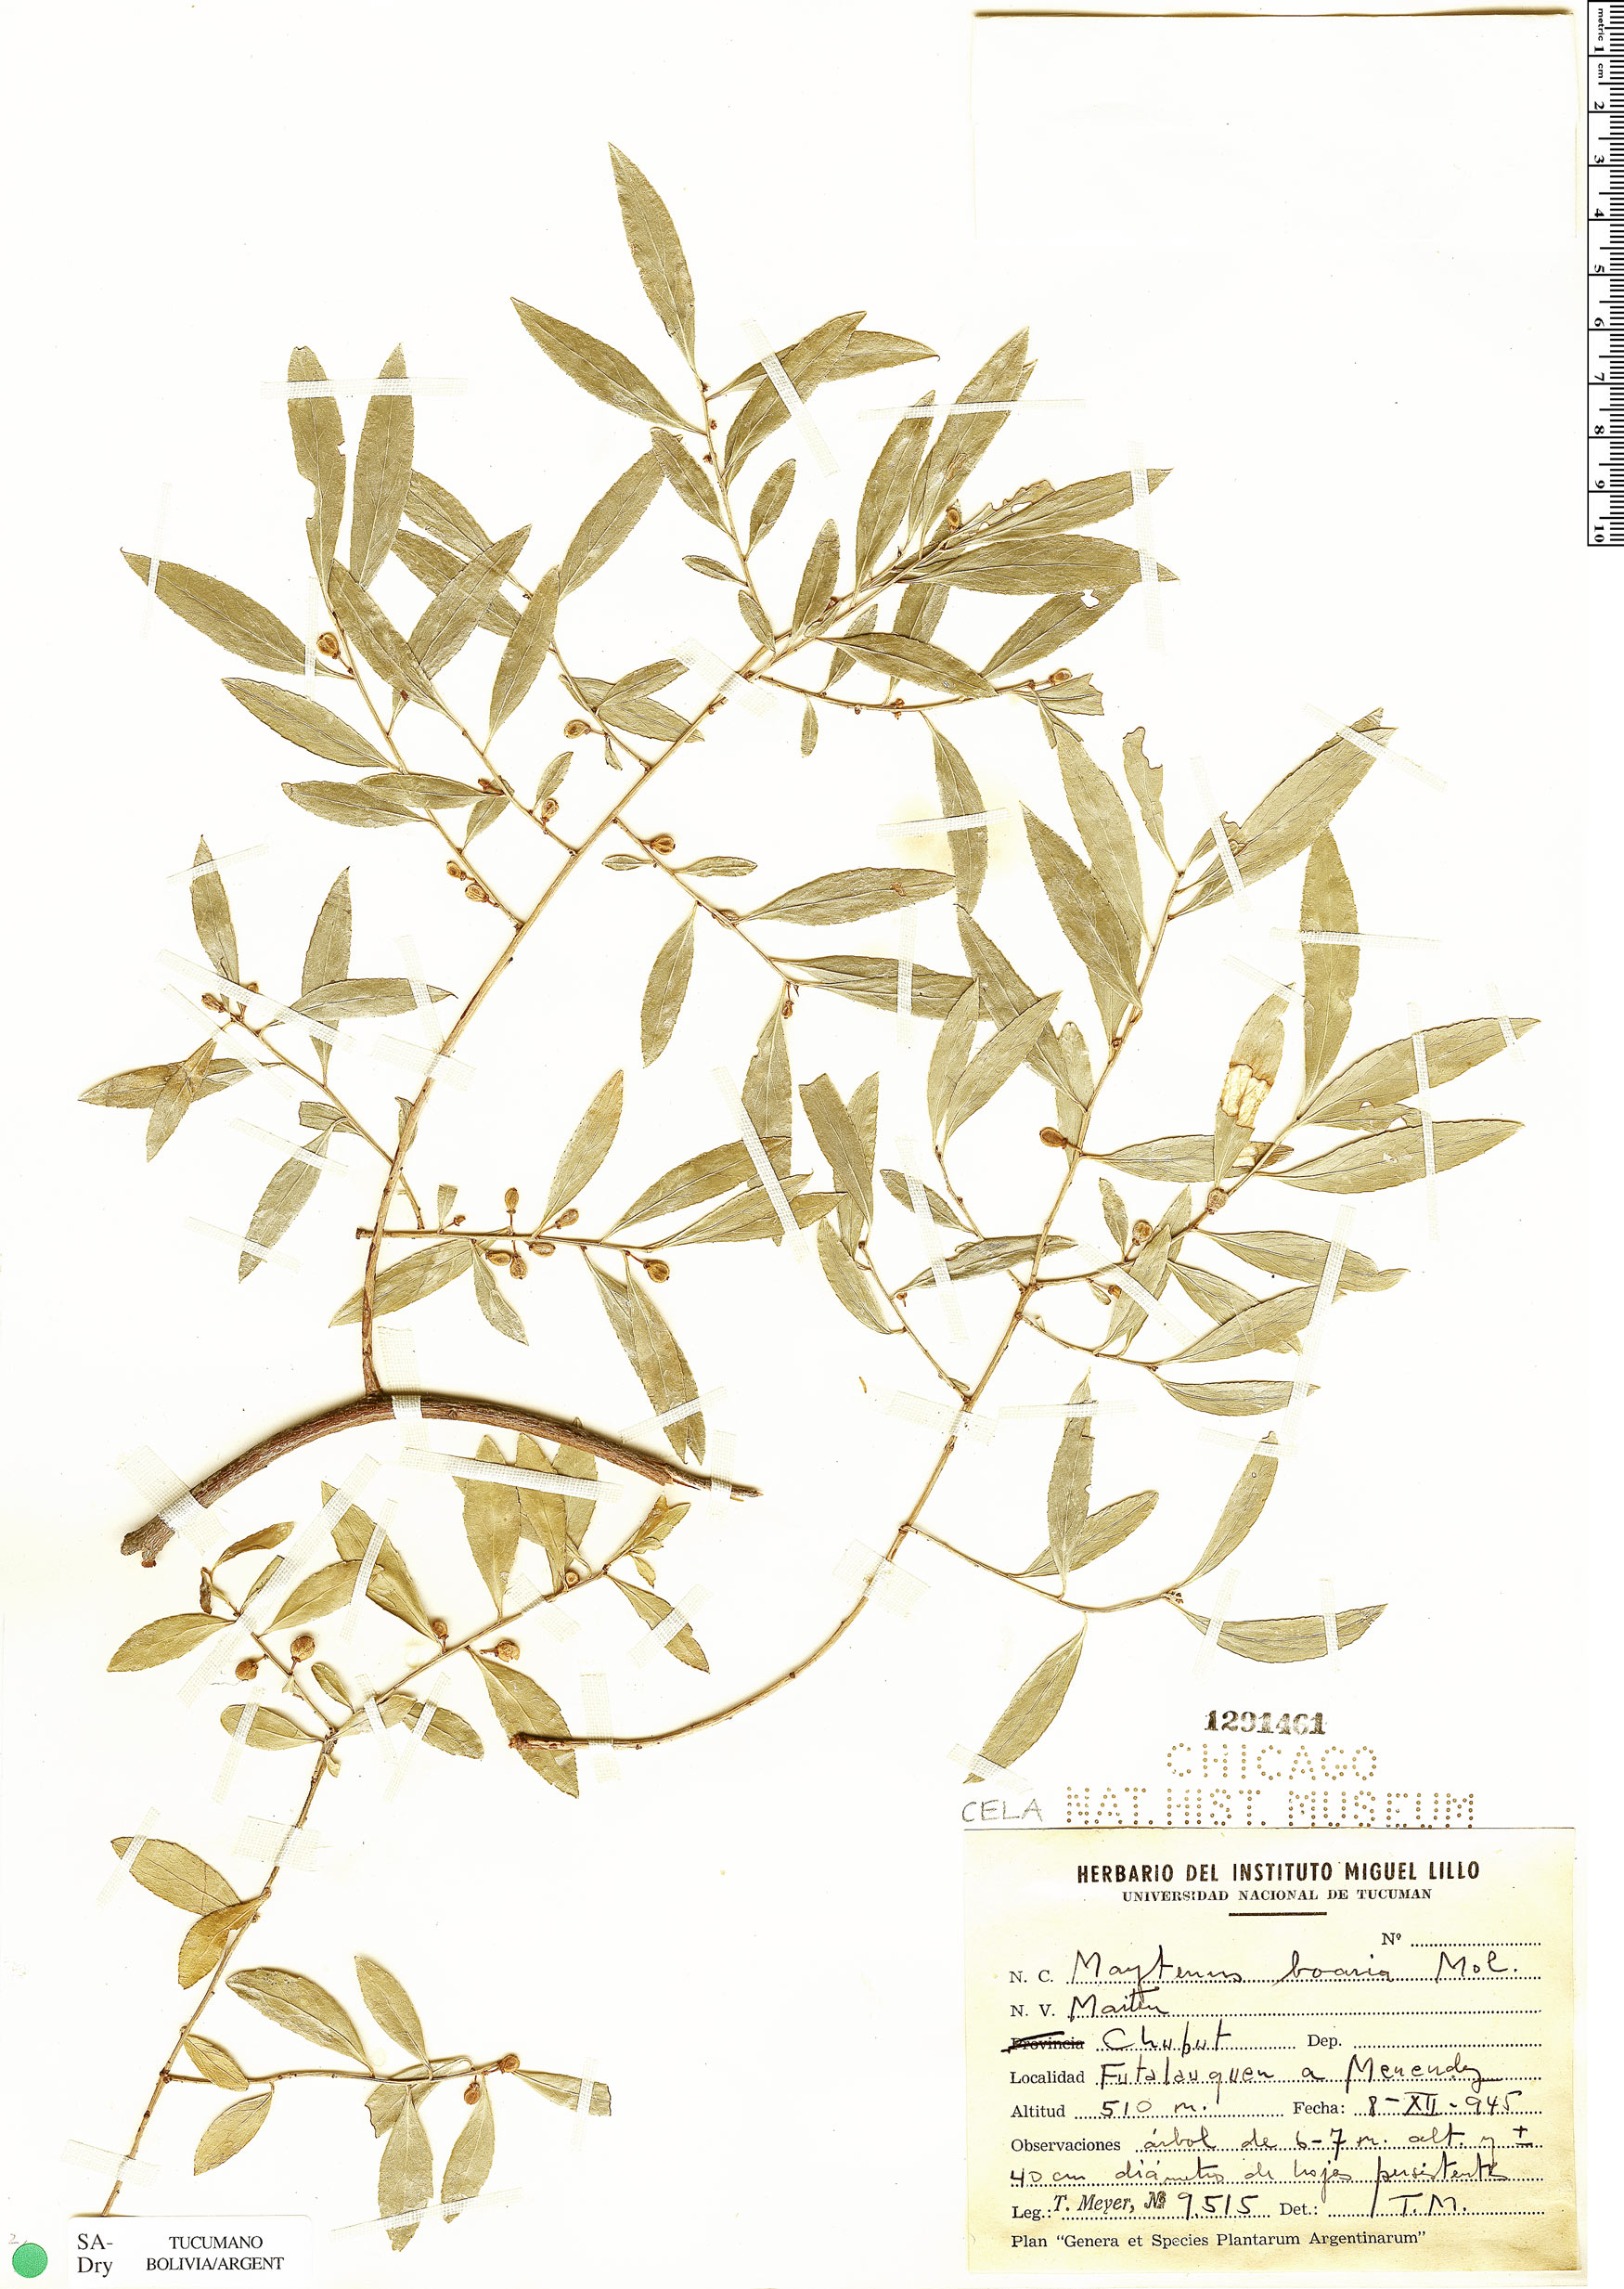 Specimen: Maytenus boaria